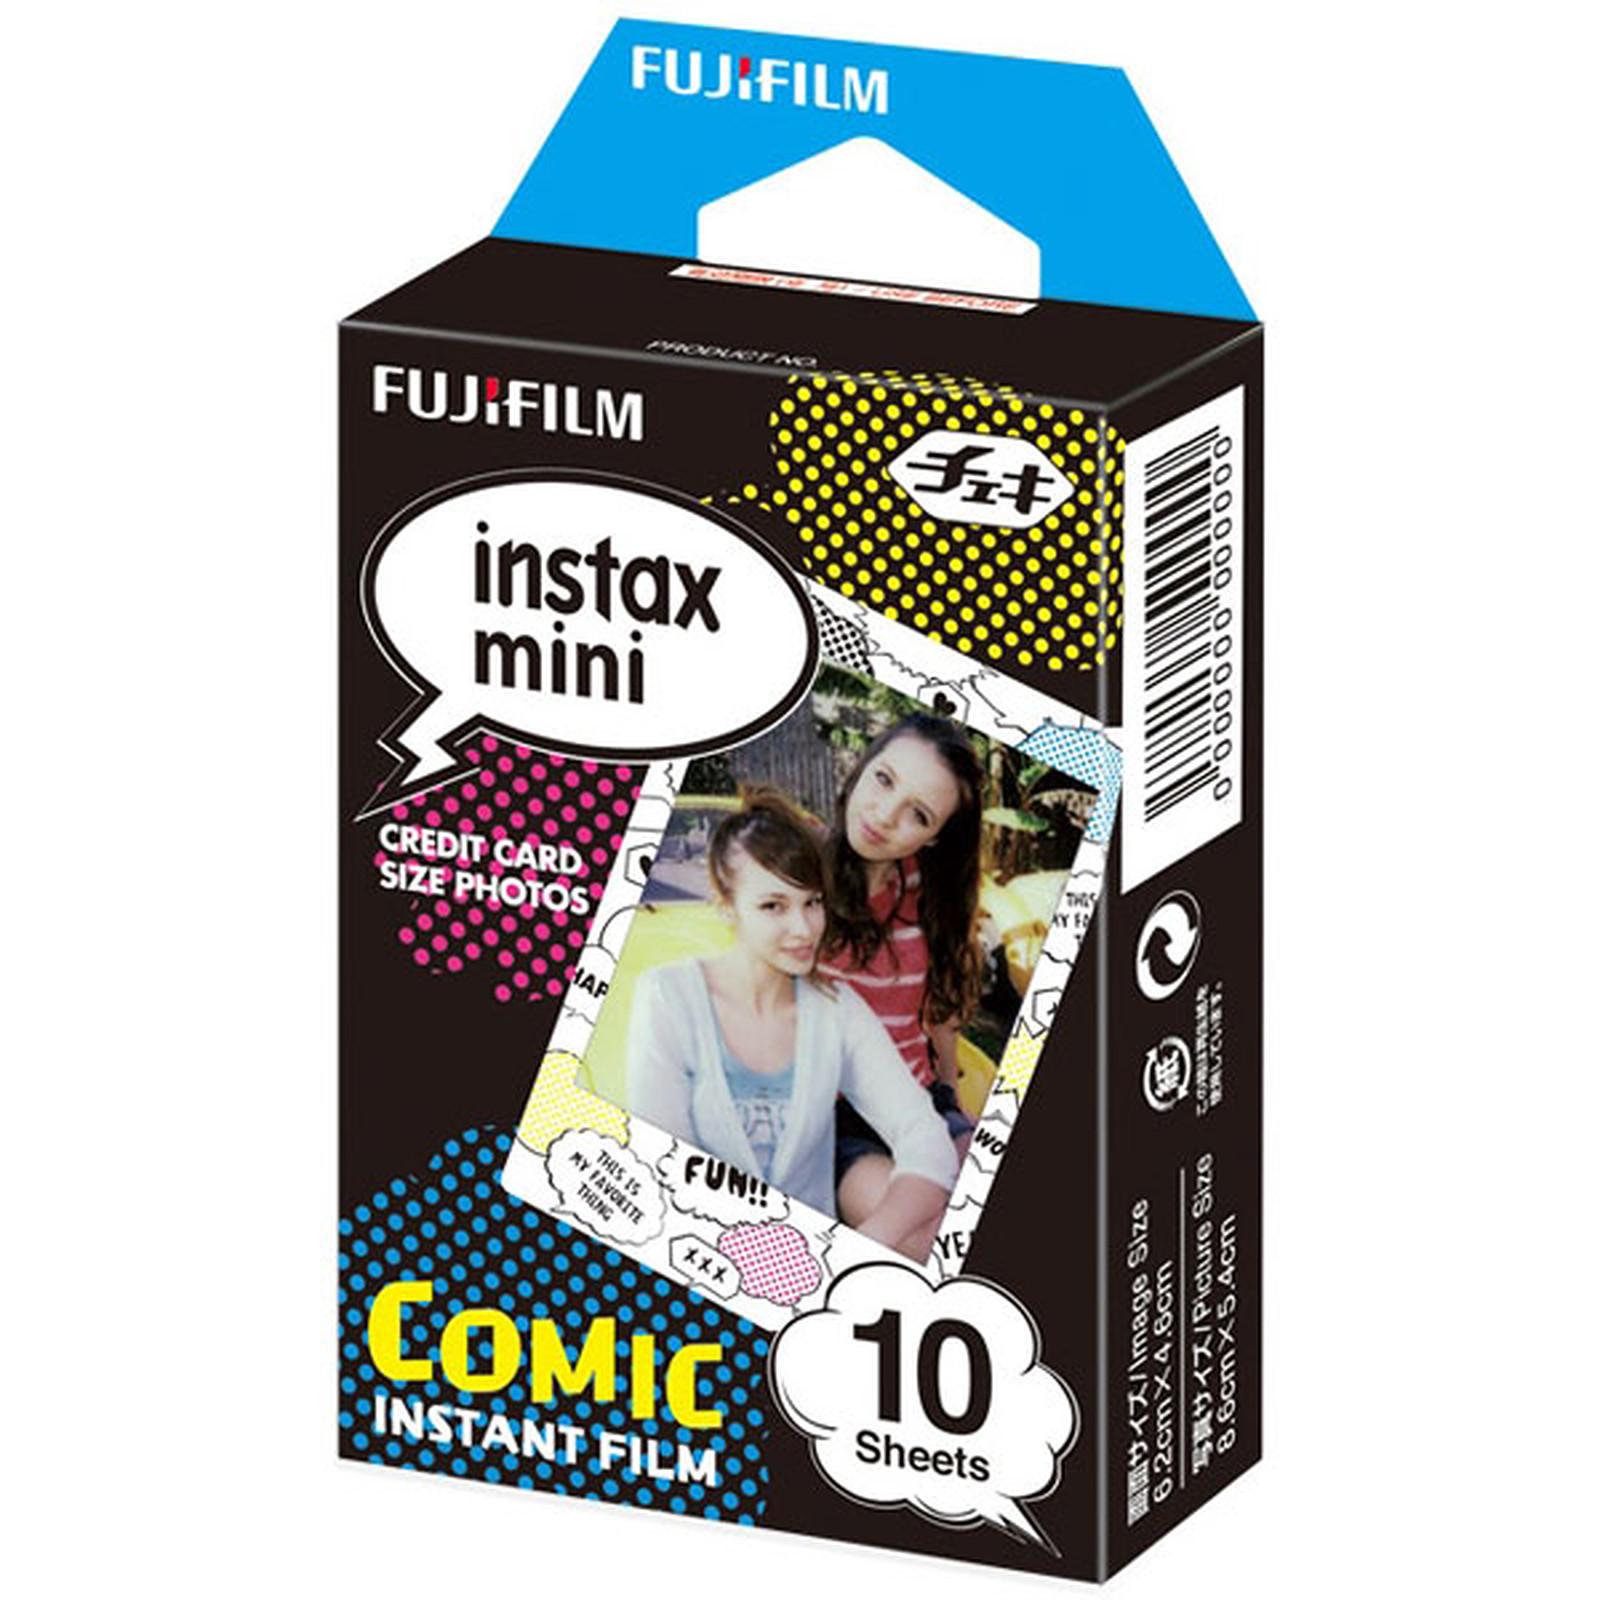 Fujifilm instax mini Comic